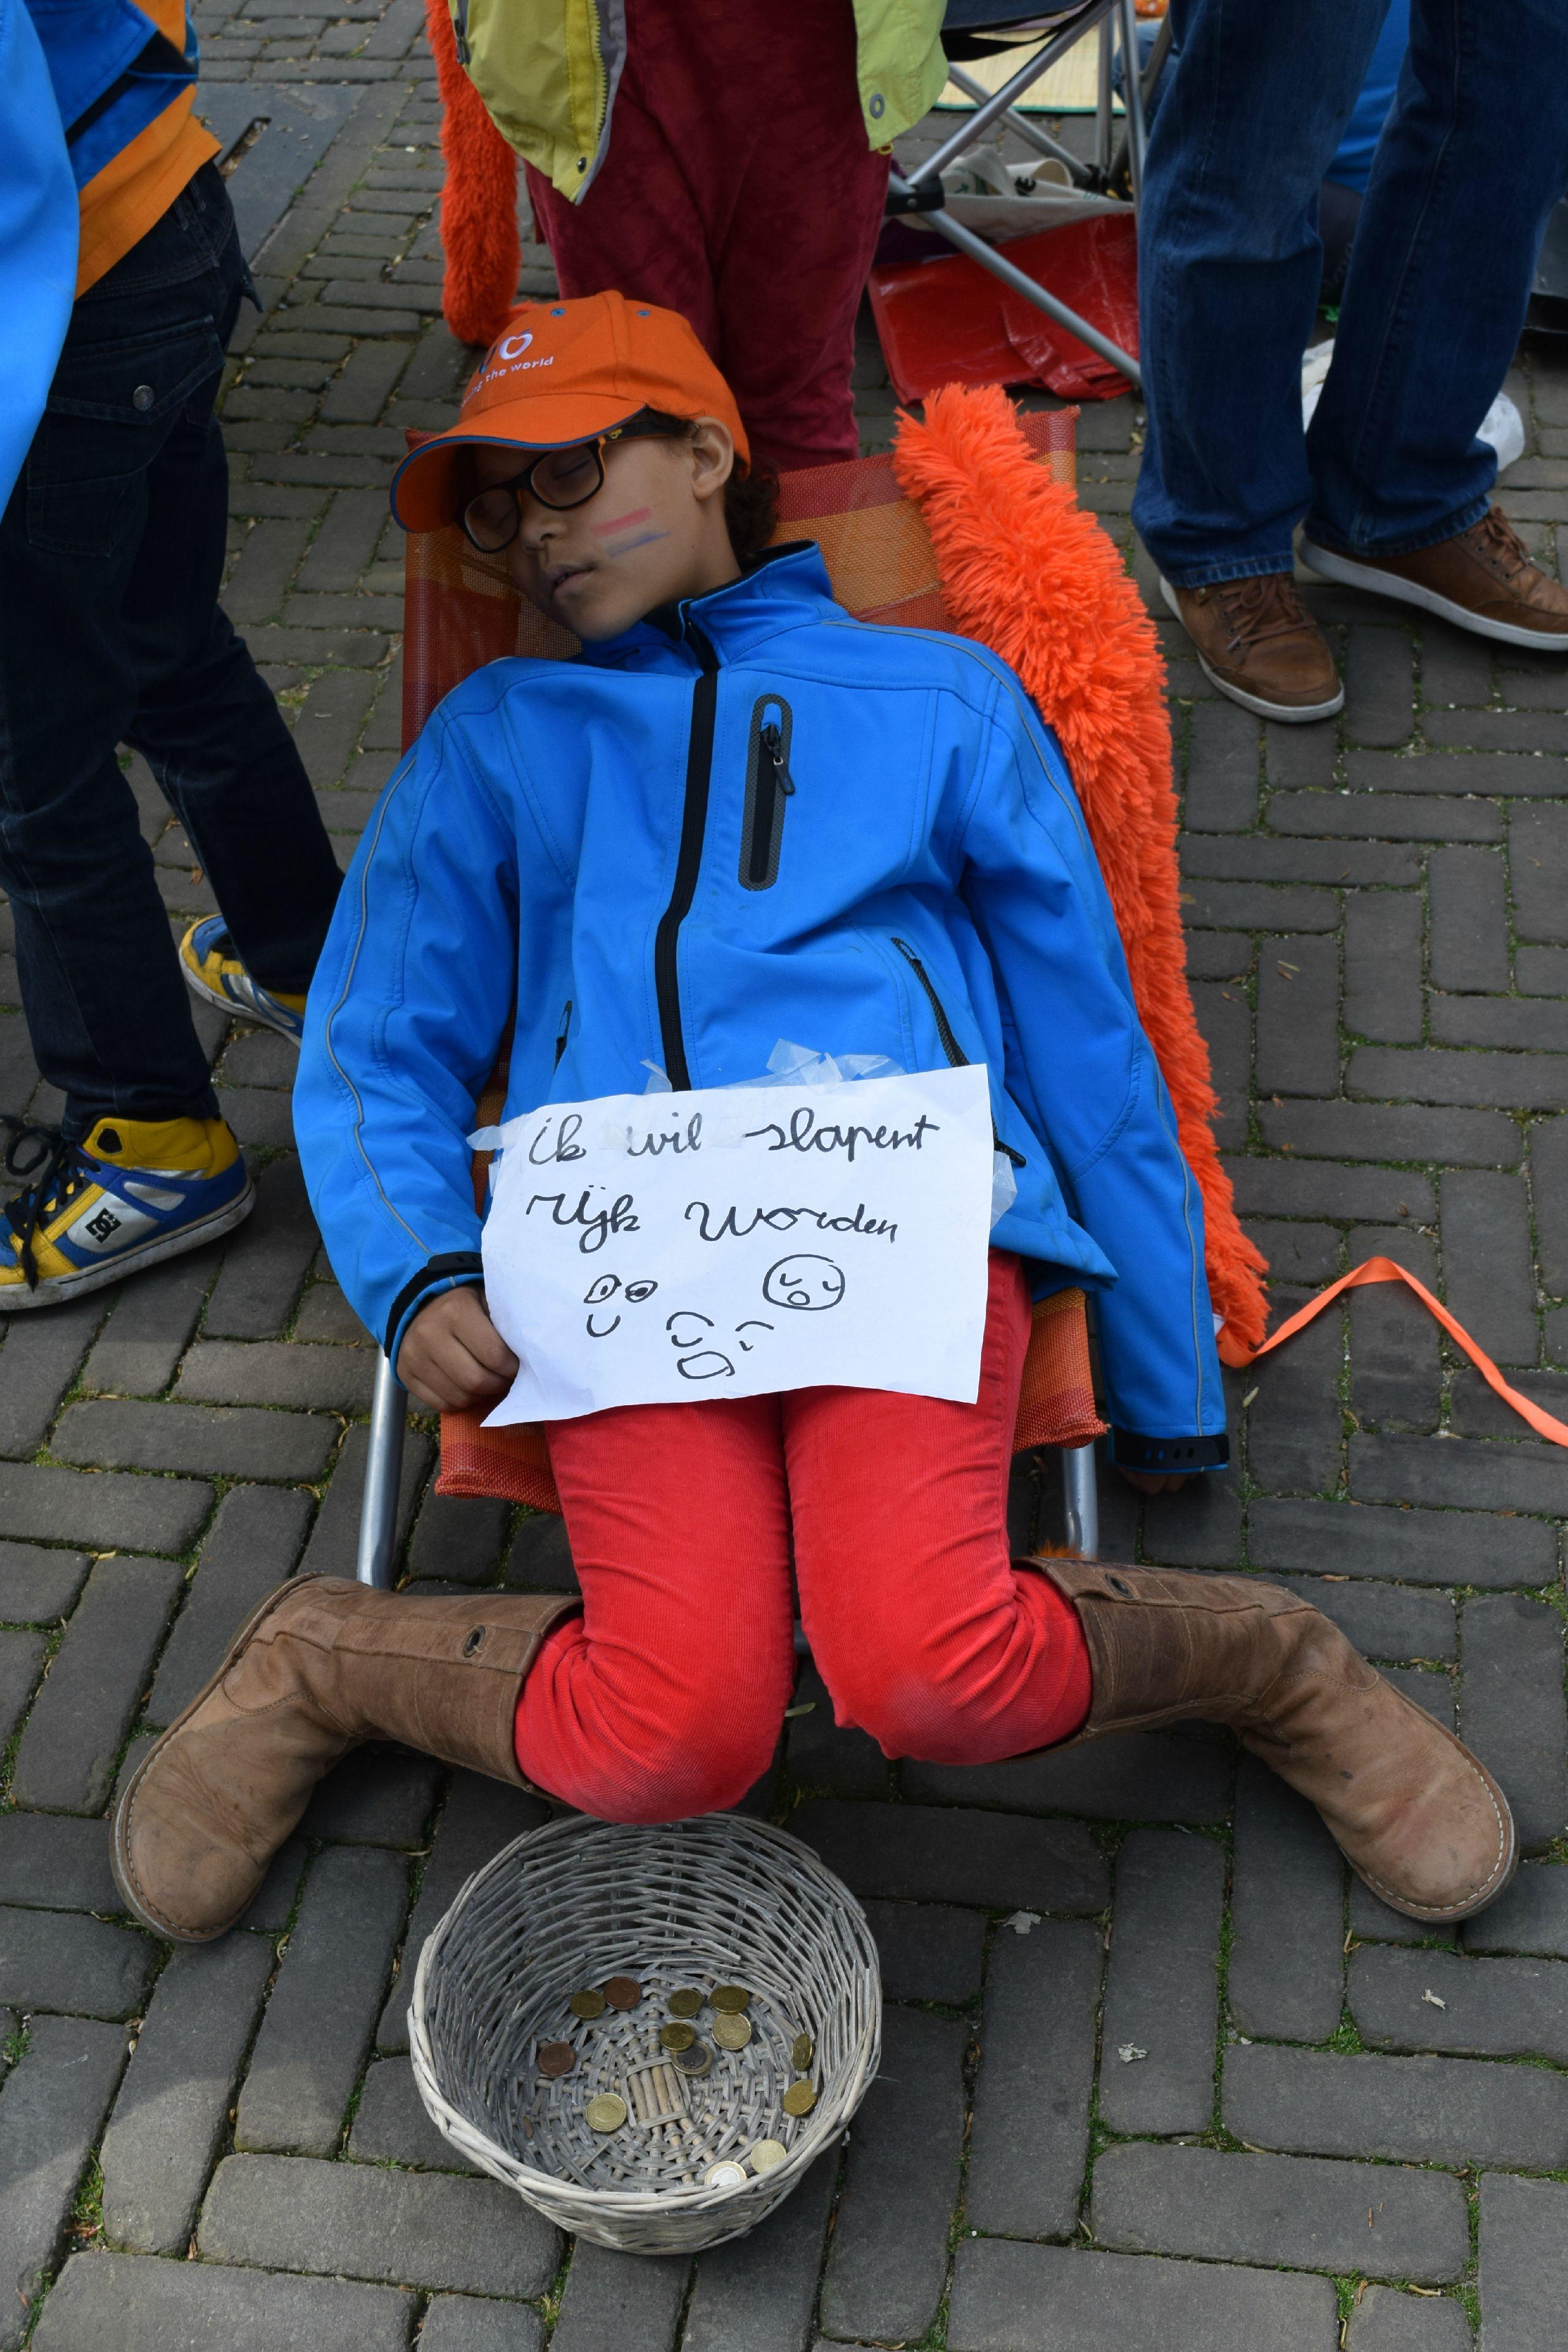 Sleep and get rich. The Dutch way.